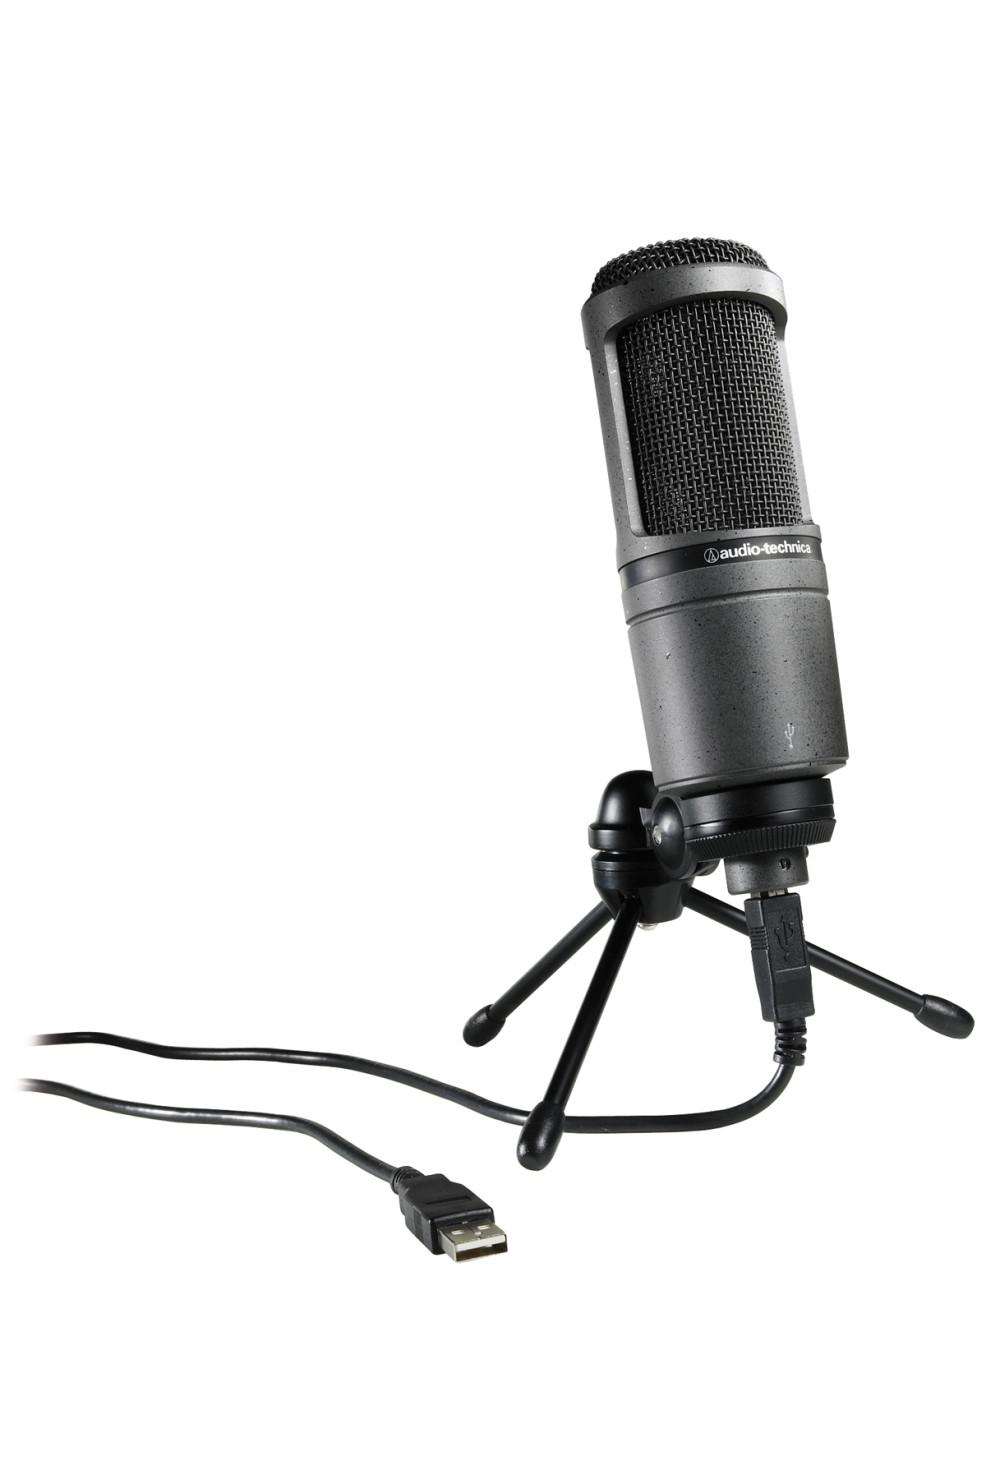 audio technica at2020 usb at2020 usb studio microphone. Black Bedroom Furniture Sets. Home Design Ideas